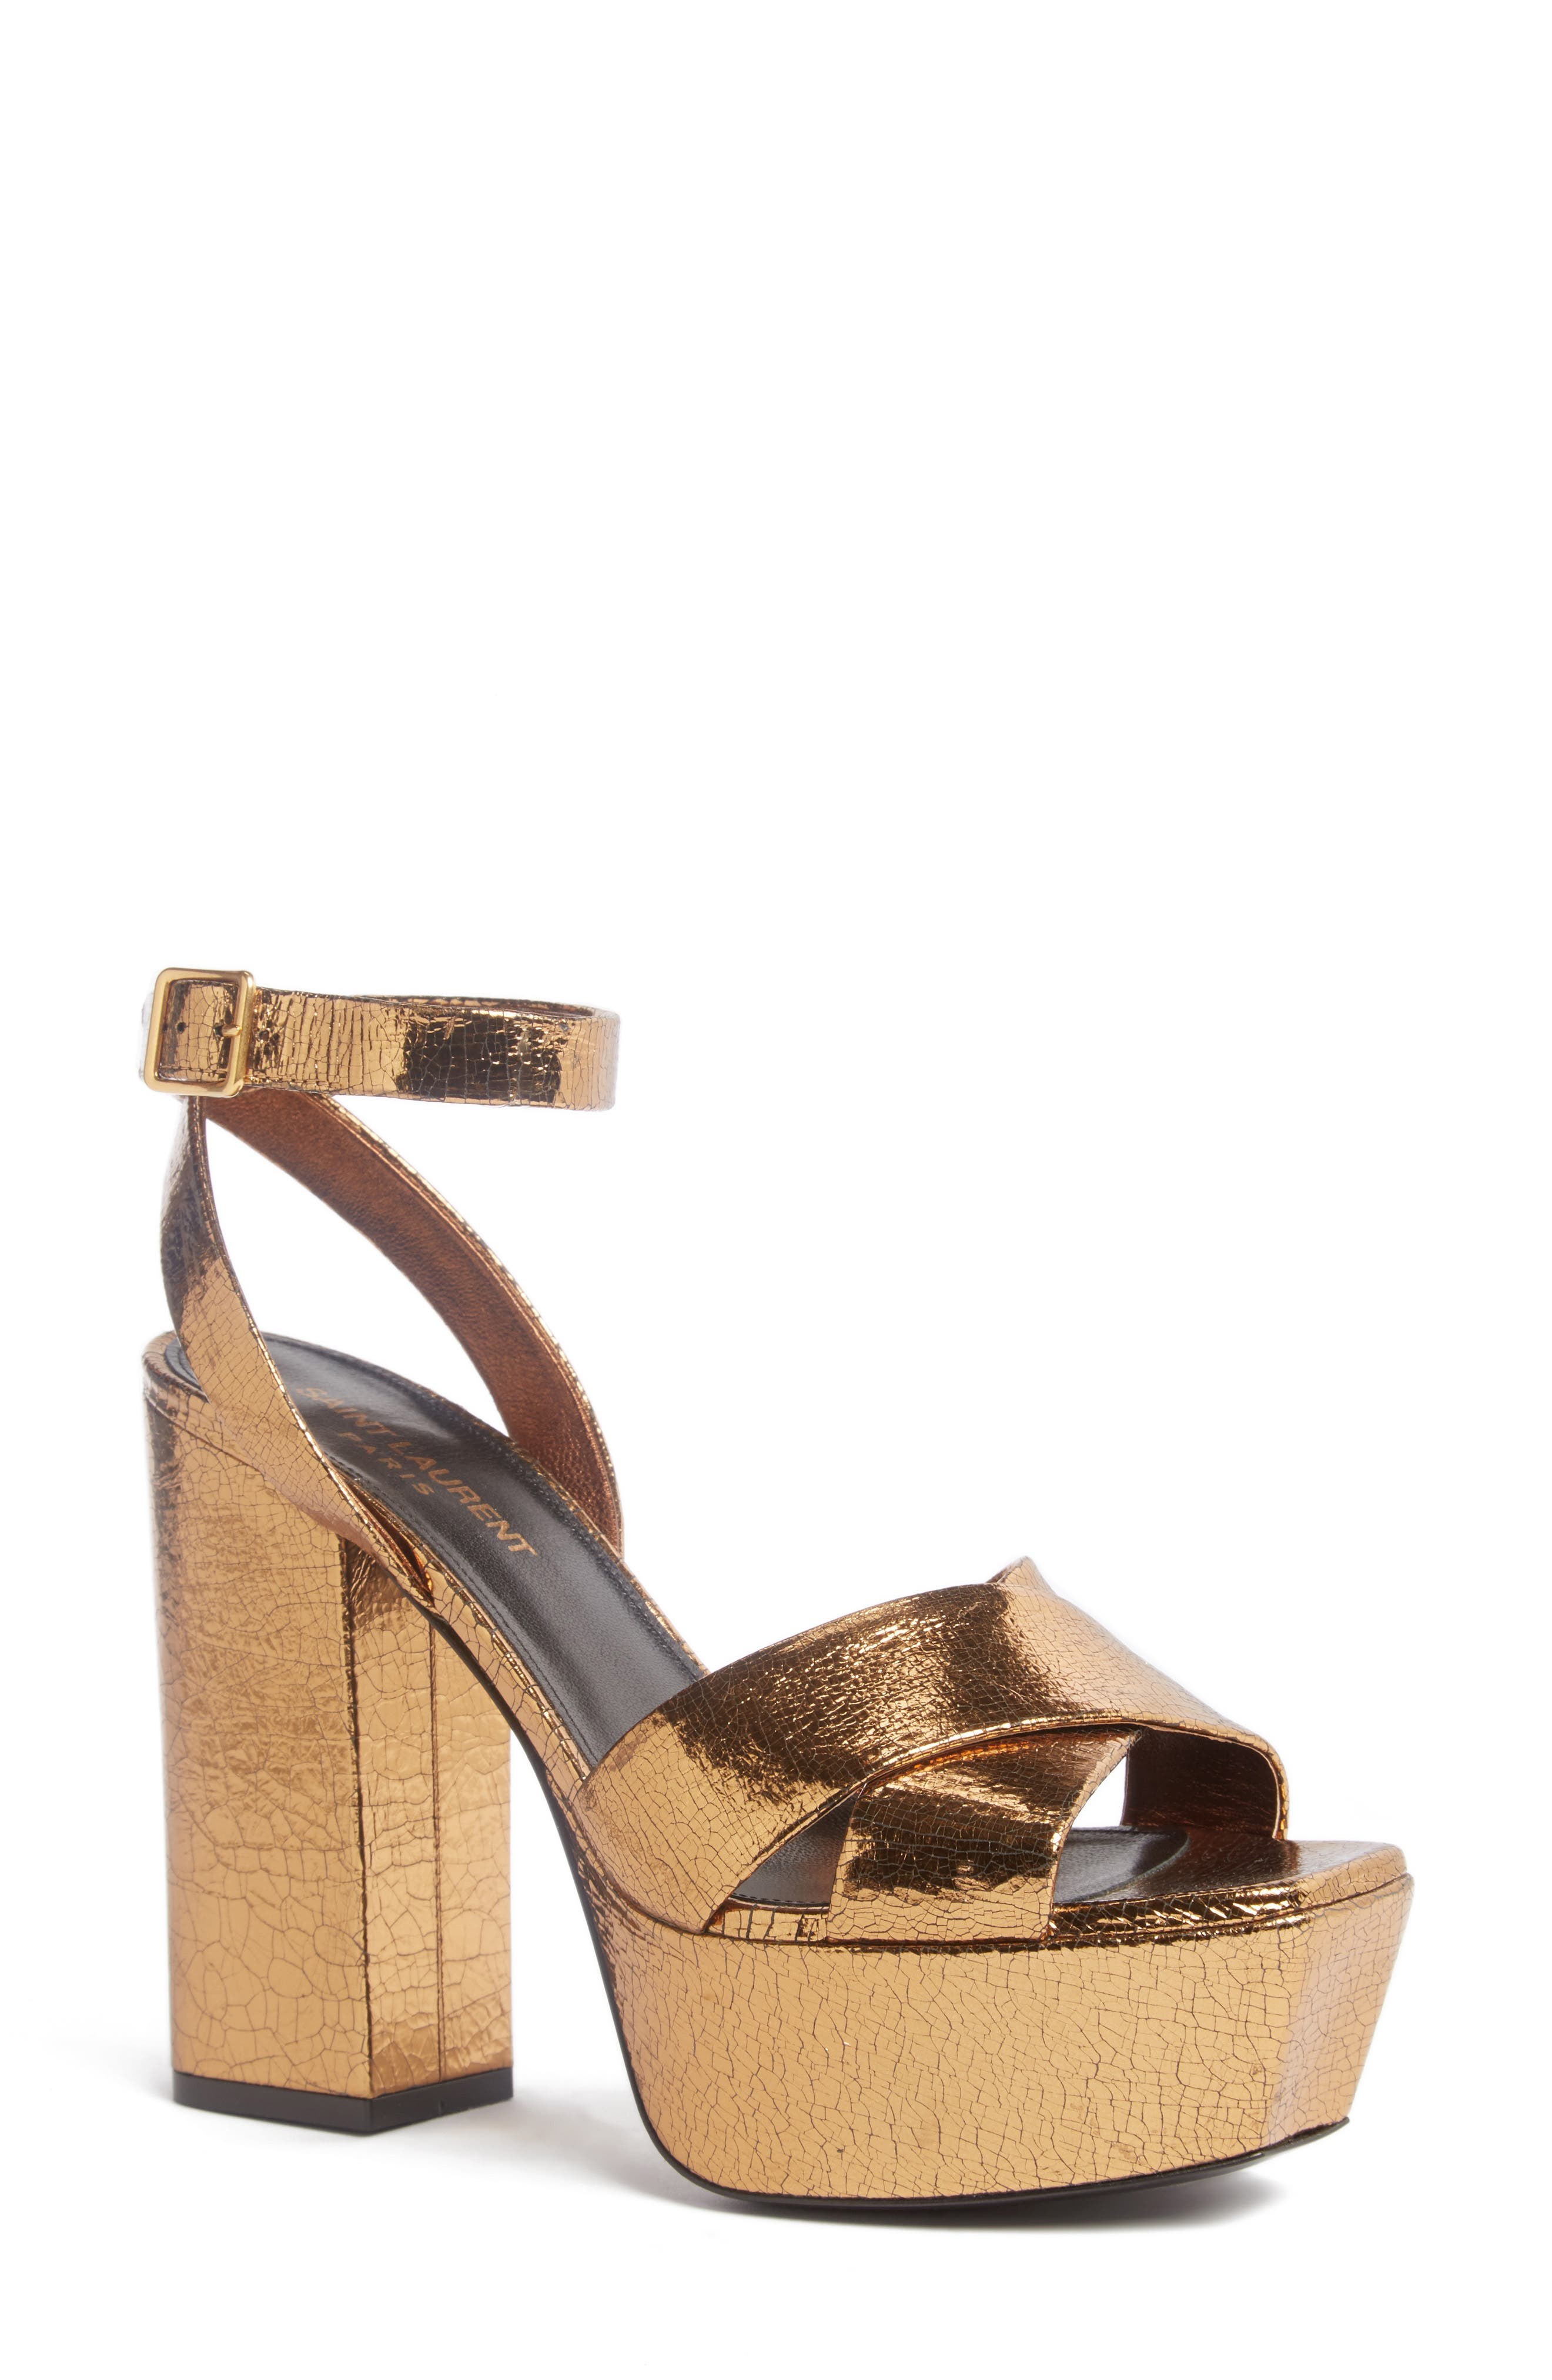 Main Image - Saint Laurent Farrah Platform Sandal (Women)